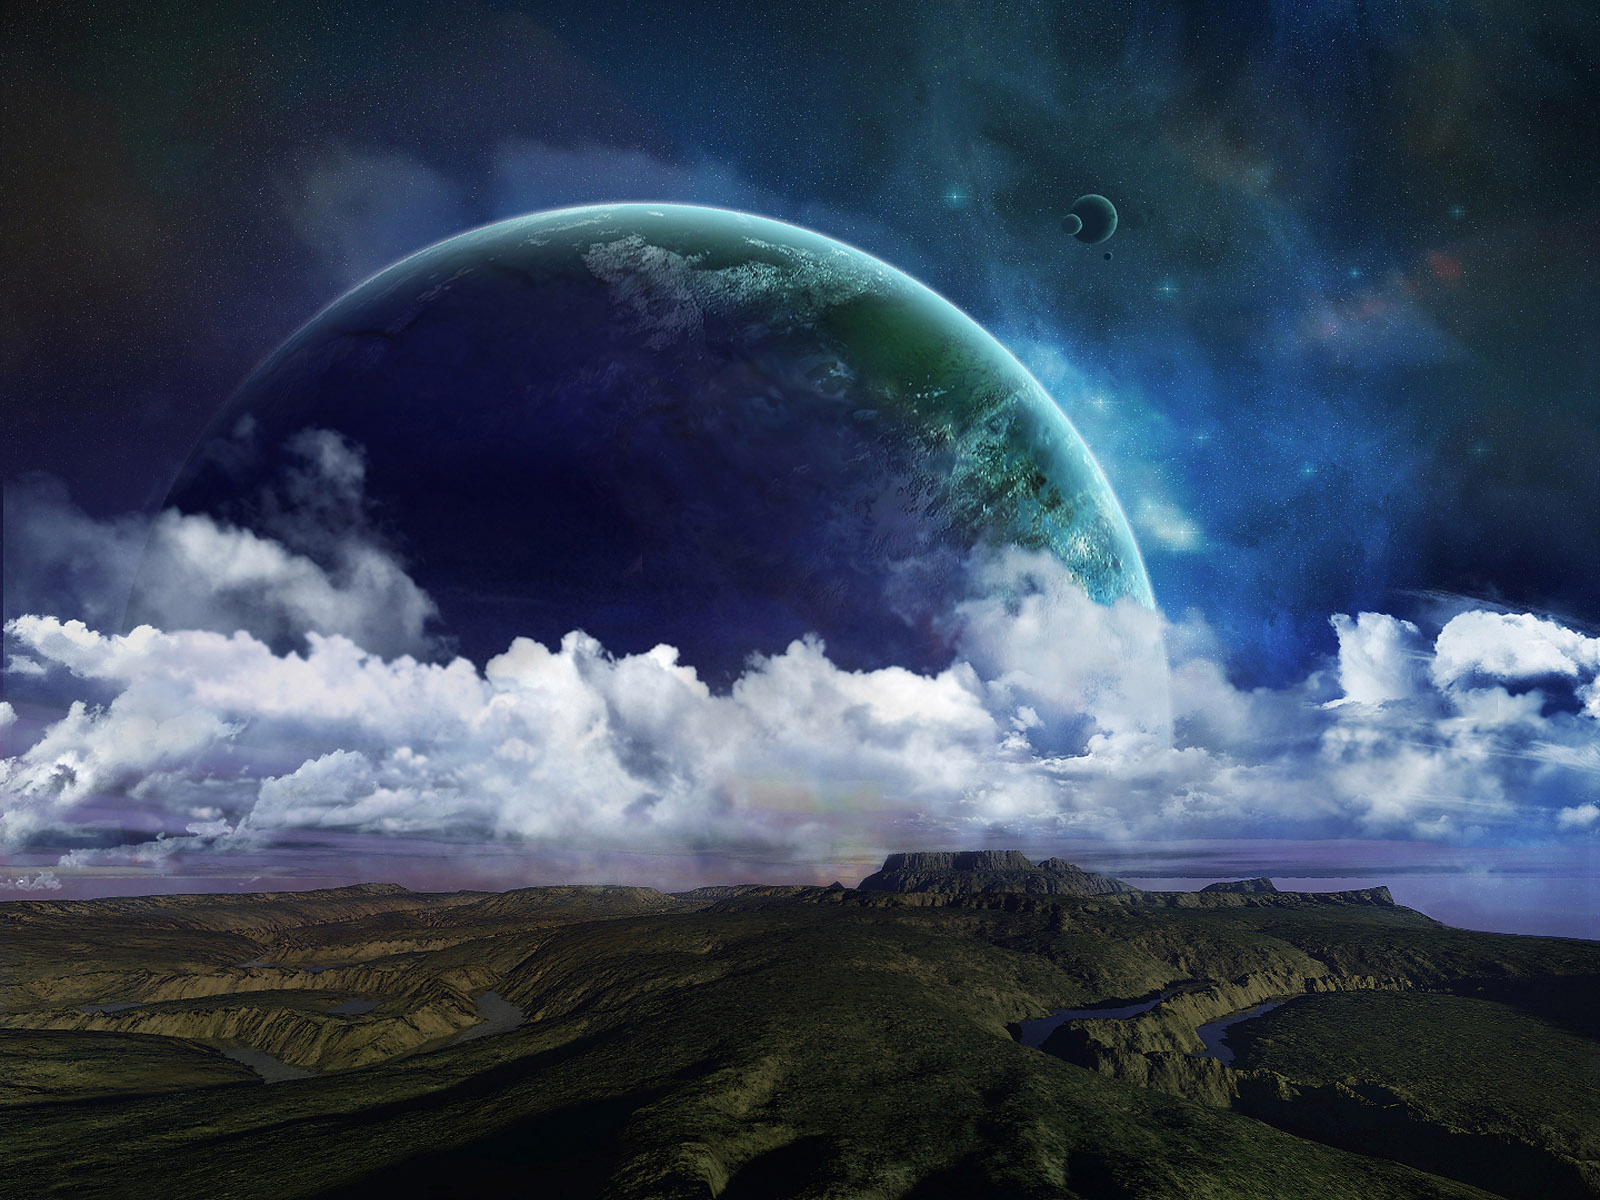 http://1.bp.blogspot.com/-uJB0l2zoAR0/TzqvcggFrDI/AAAAAAAAASI/TPJYiNvZgB0/s1600/Space_Art_Wallpapers_00.jpg